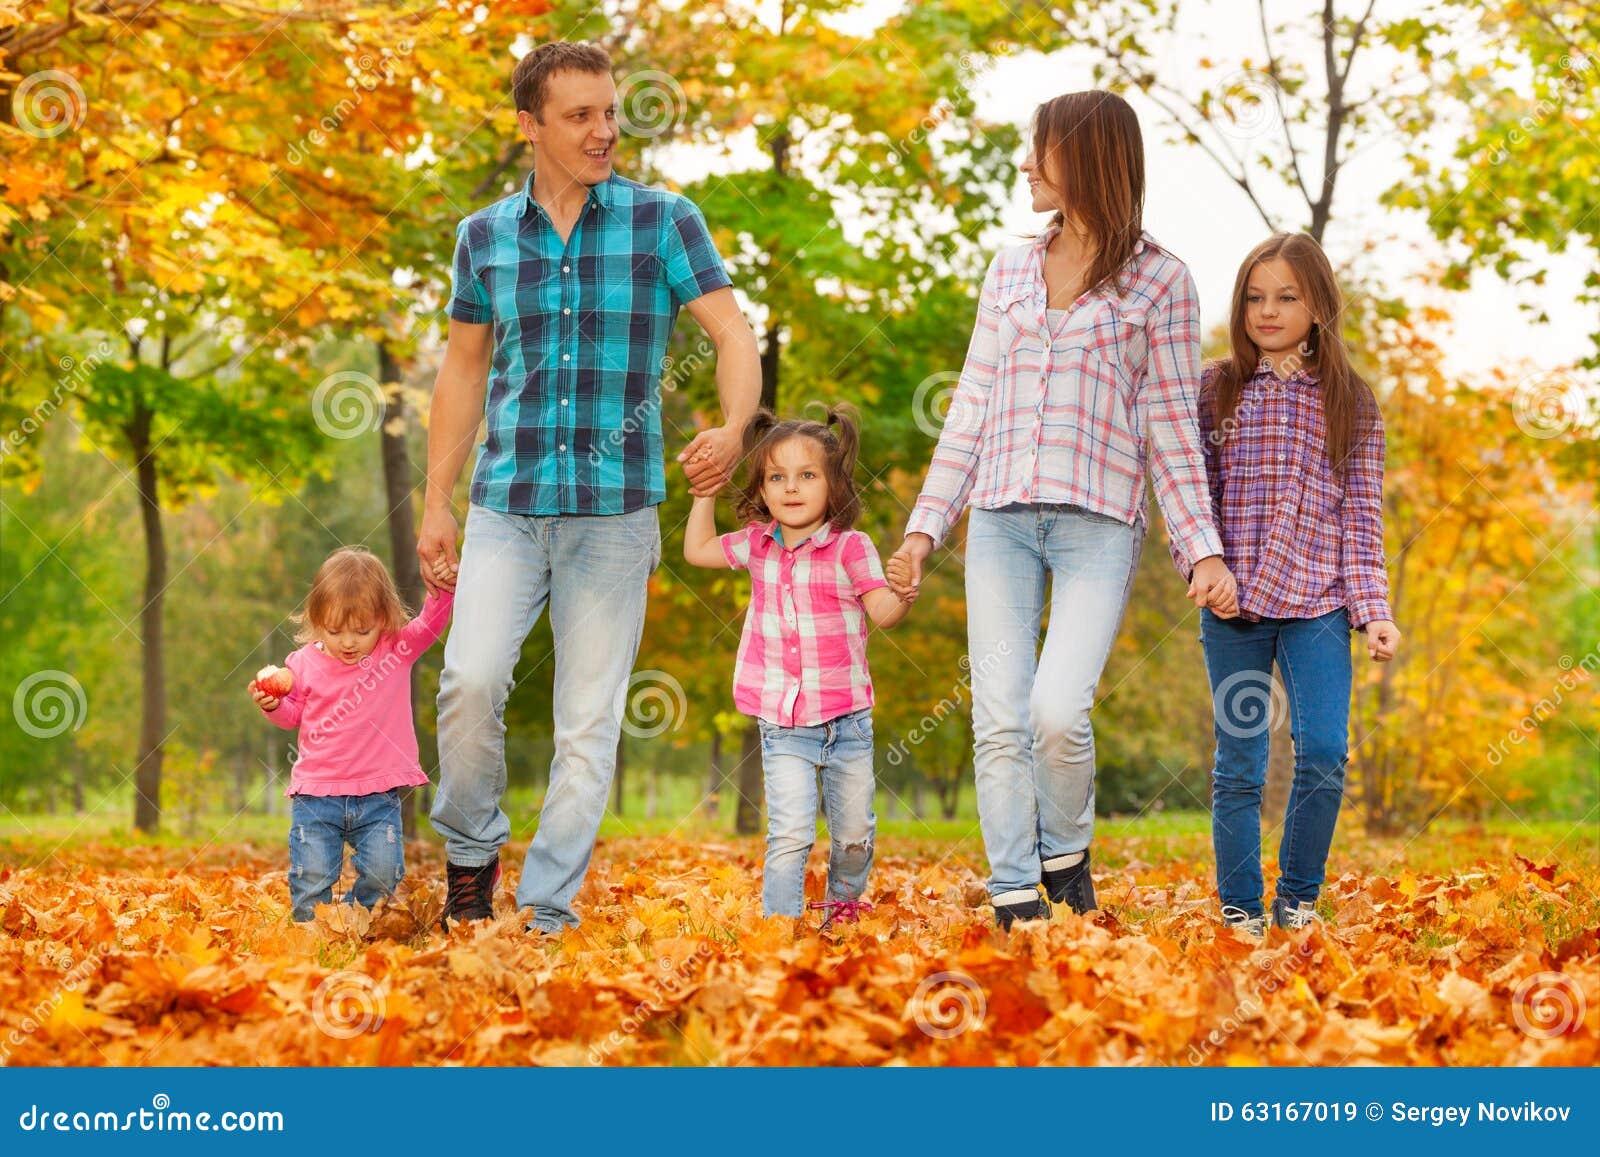 3 sisters photo shoot ideas - Happy Family Walk In Autumn October Park Stock